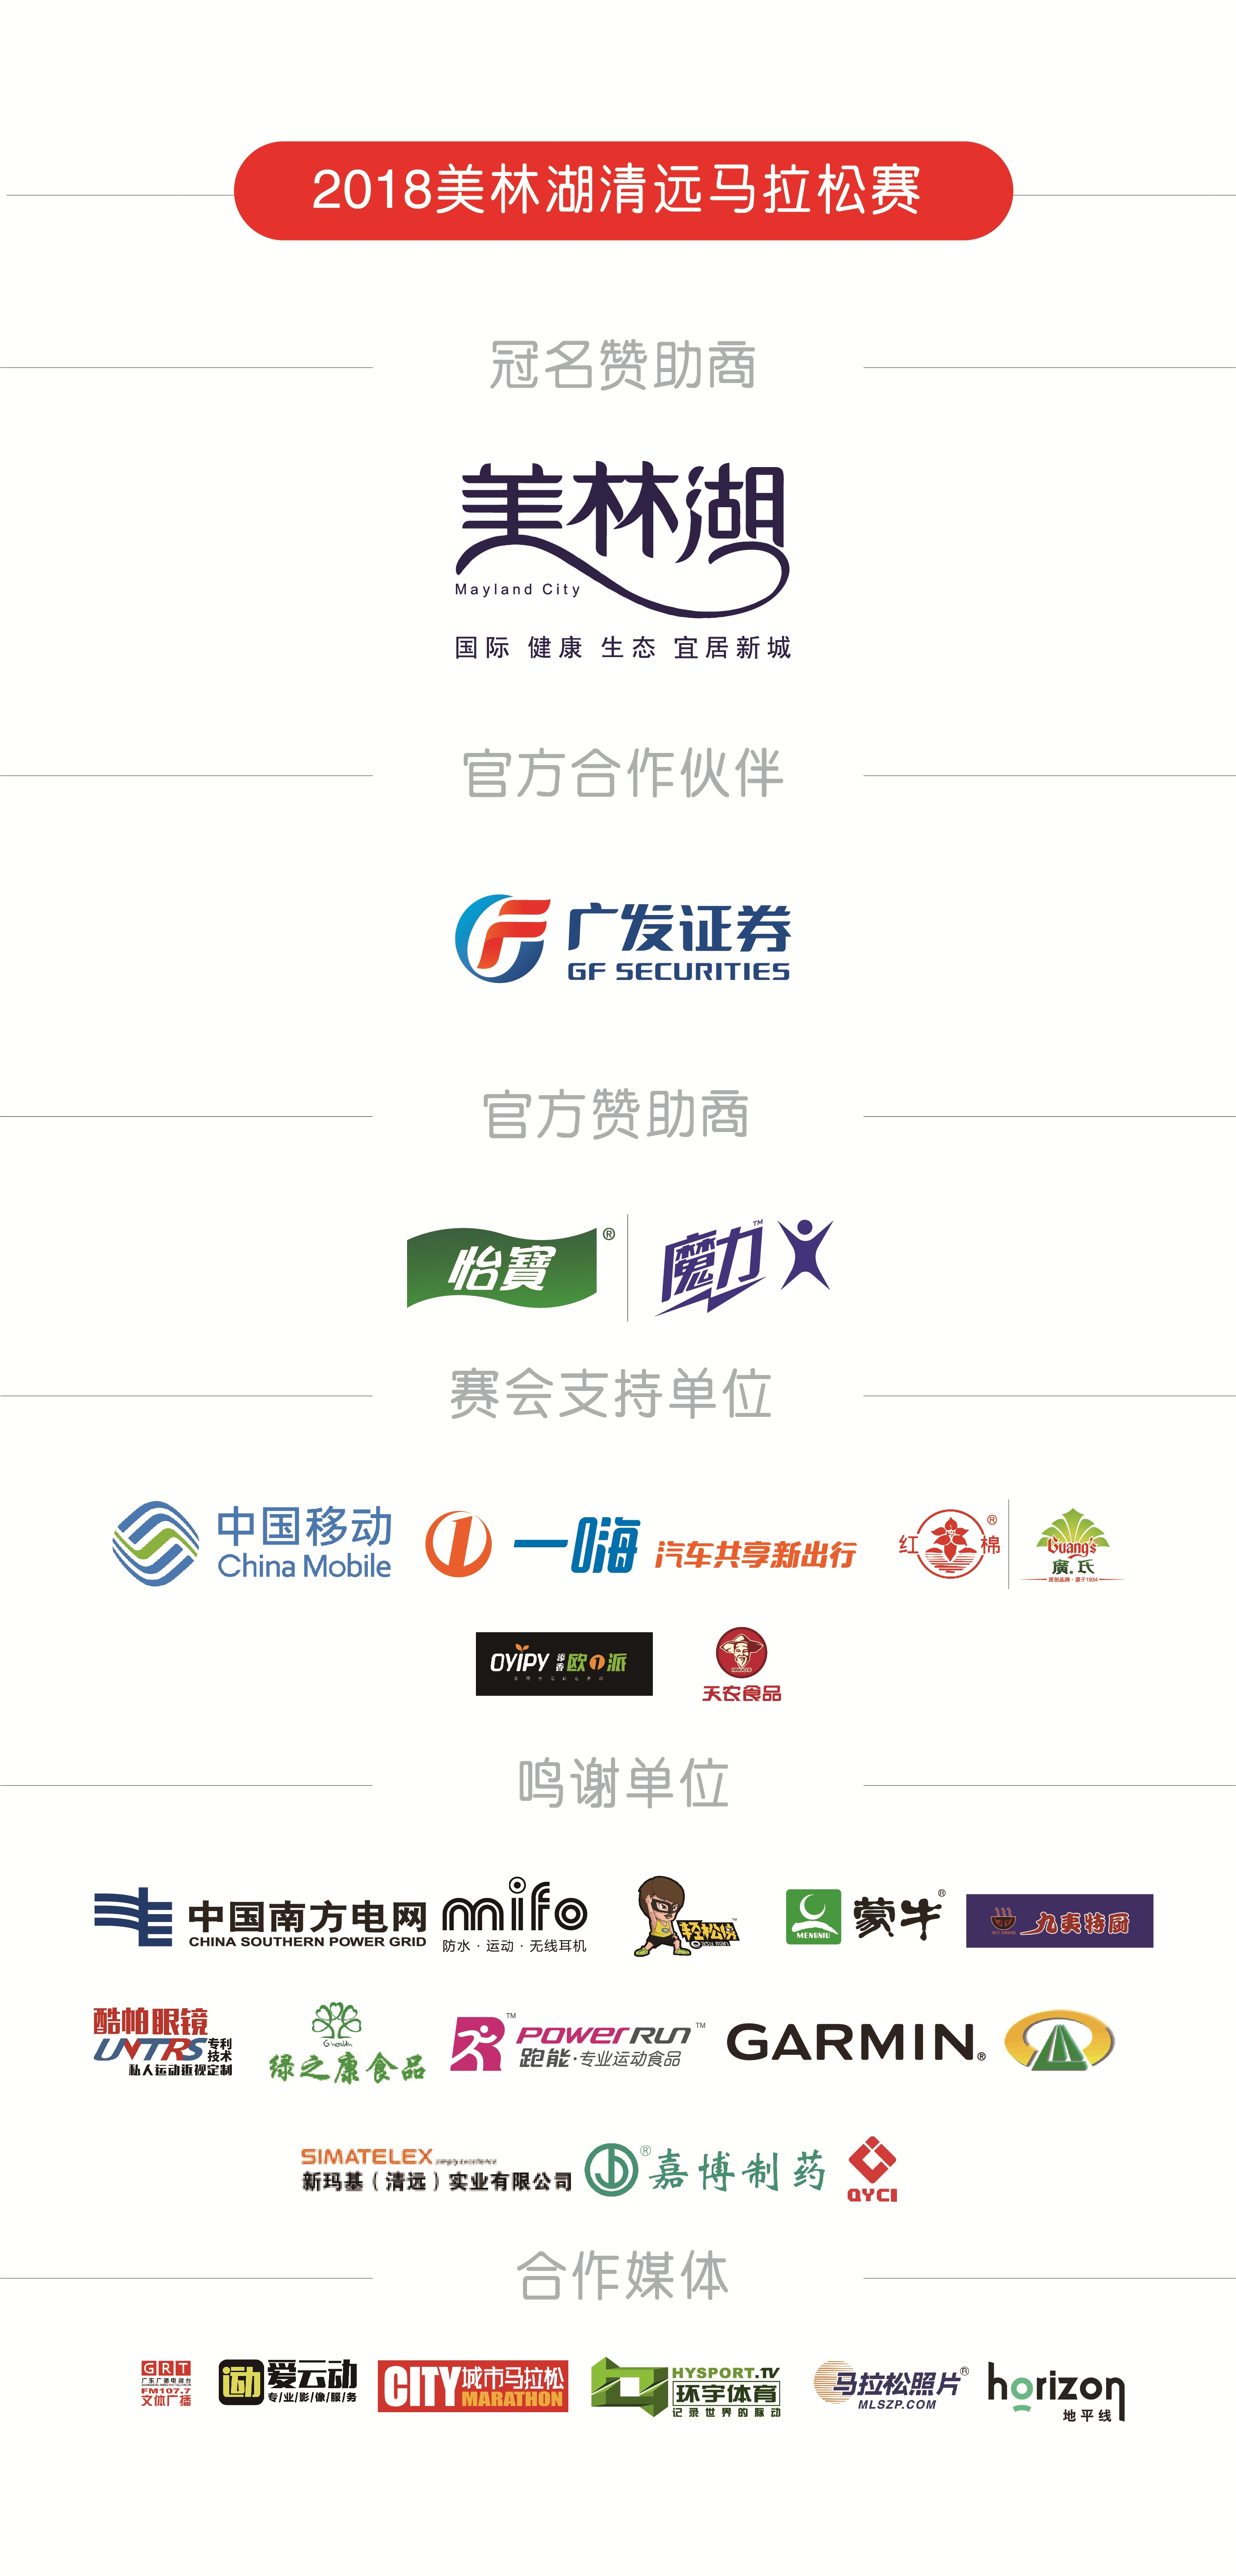 http://img.sport-china.cn/180310005aa2b50dcdda3.jpeg